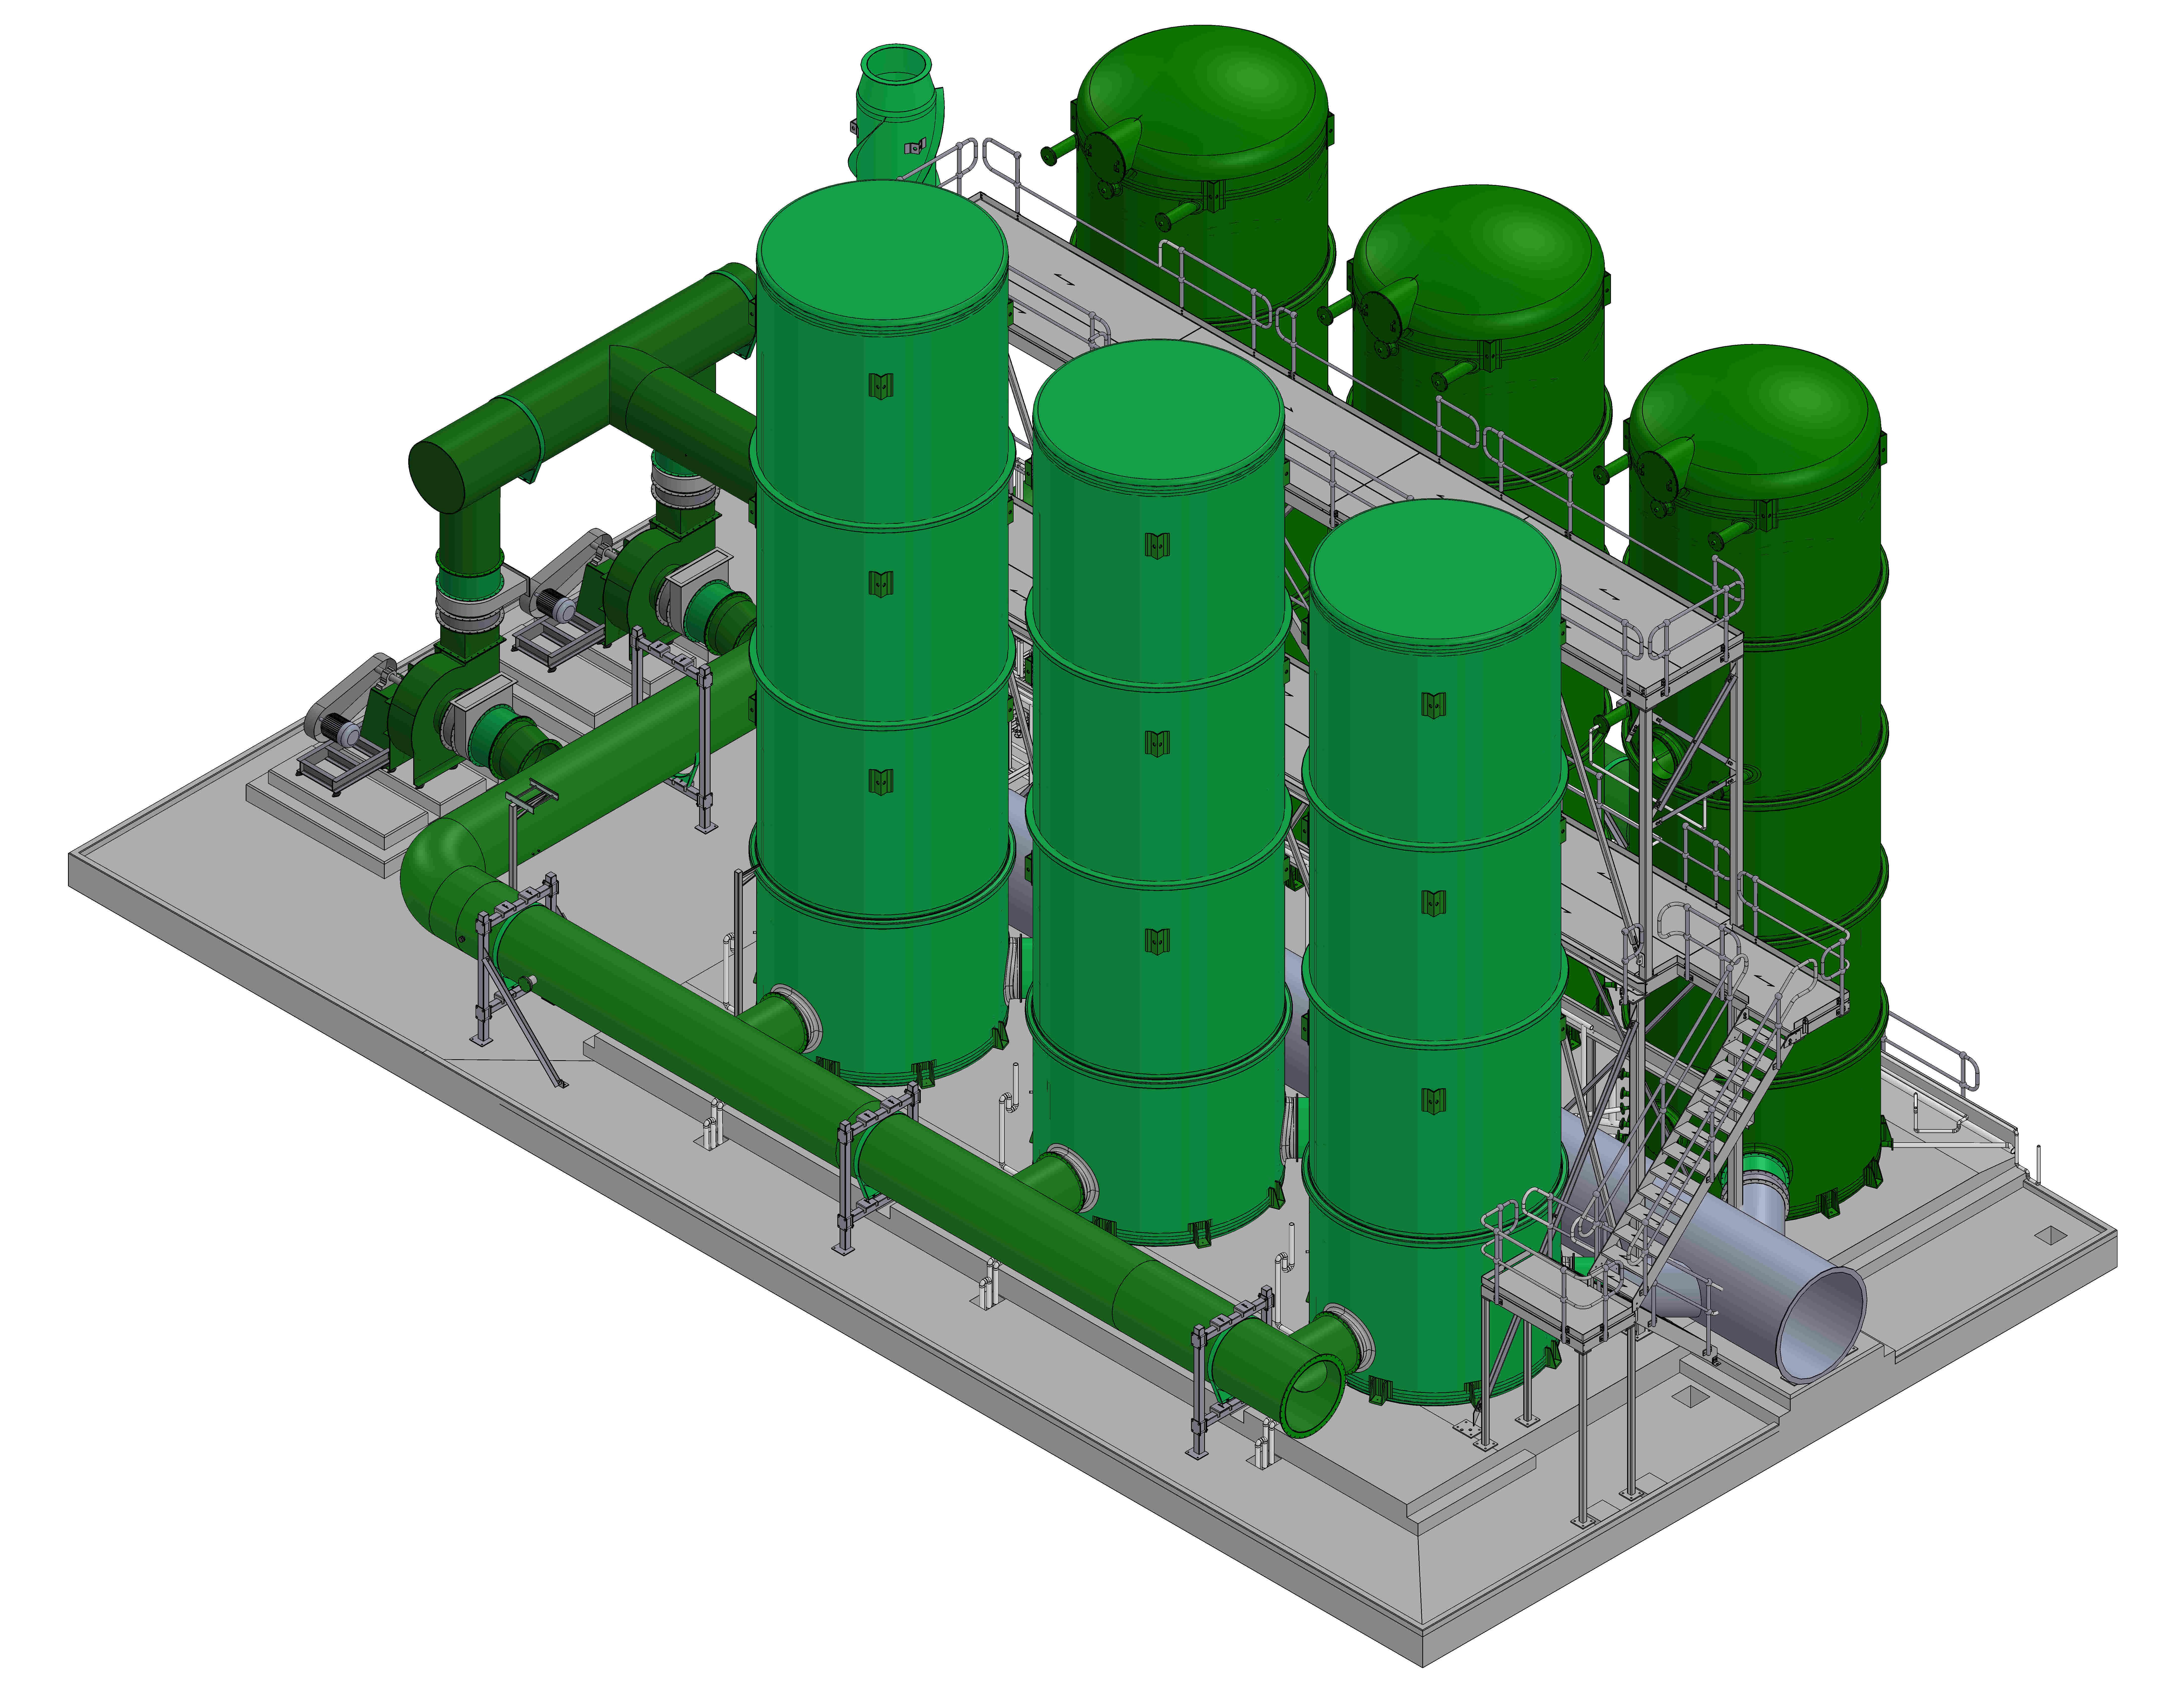 Plant Design Engineering Services